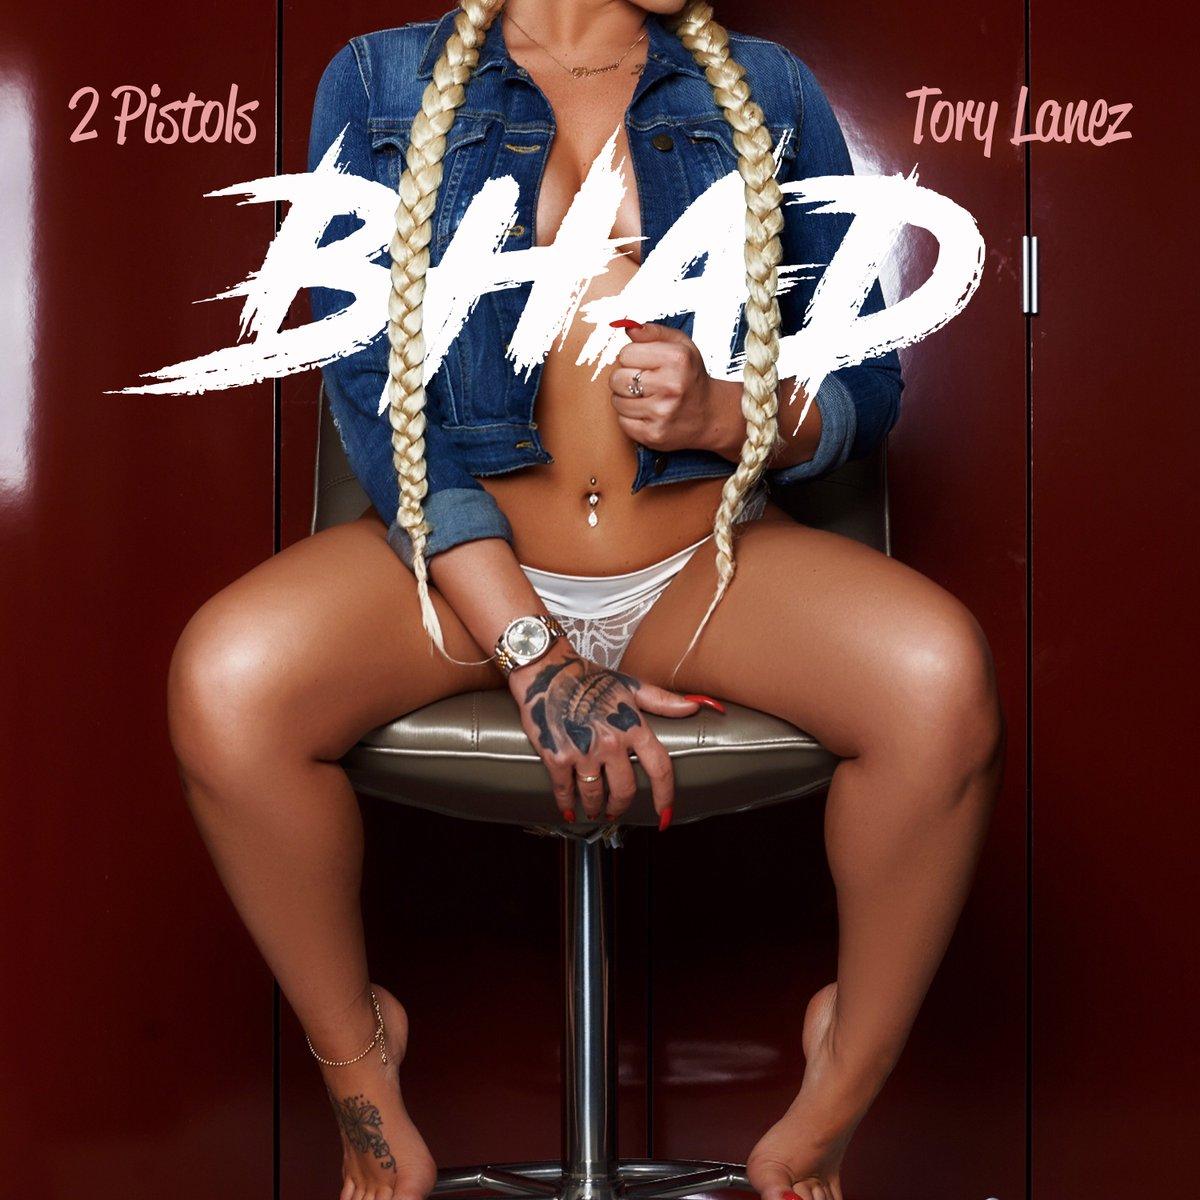 NEW MUSIC ON DA WAY #BHAD FT @torylanez COMING SOONpic.twitter.com/Q1uE5b0Vdb